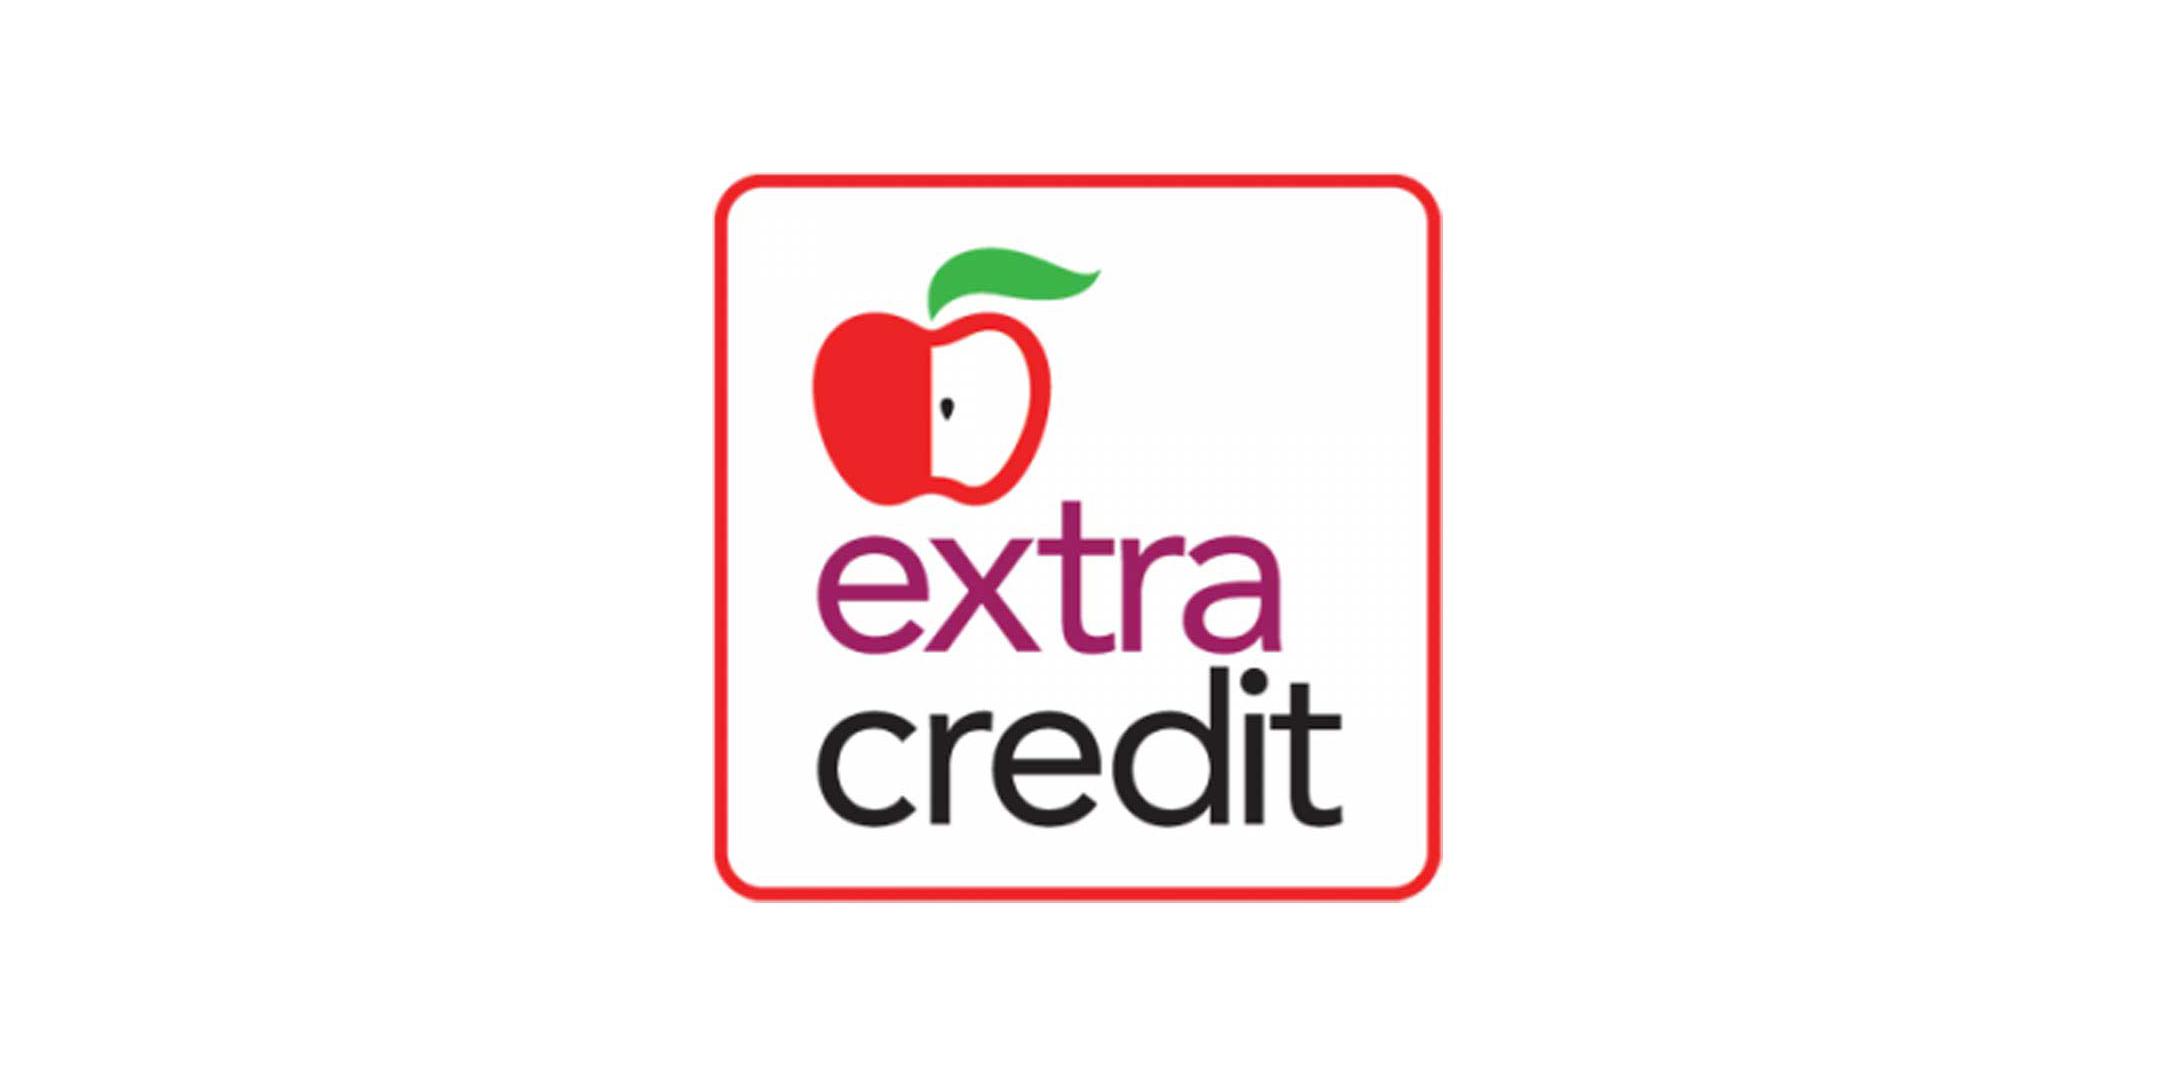 Raley's Extra Credit Grants program logo